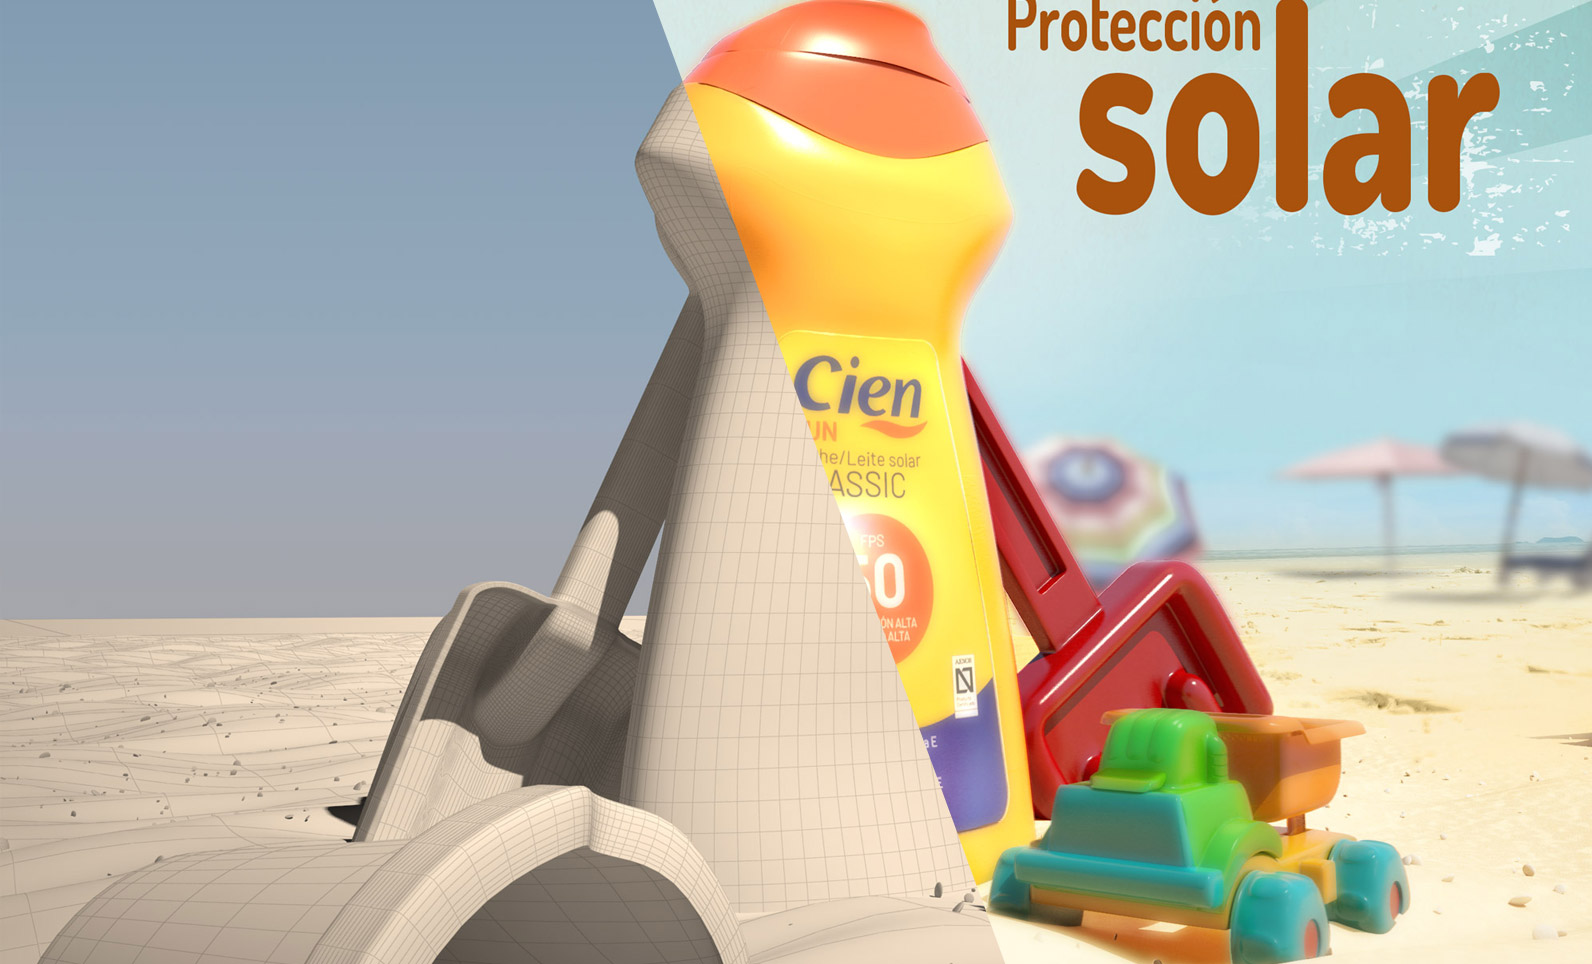 Sun lotion advertising